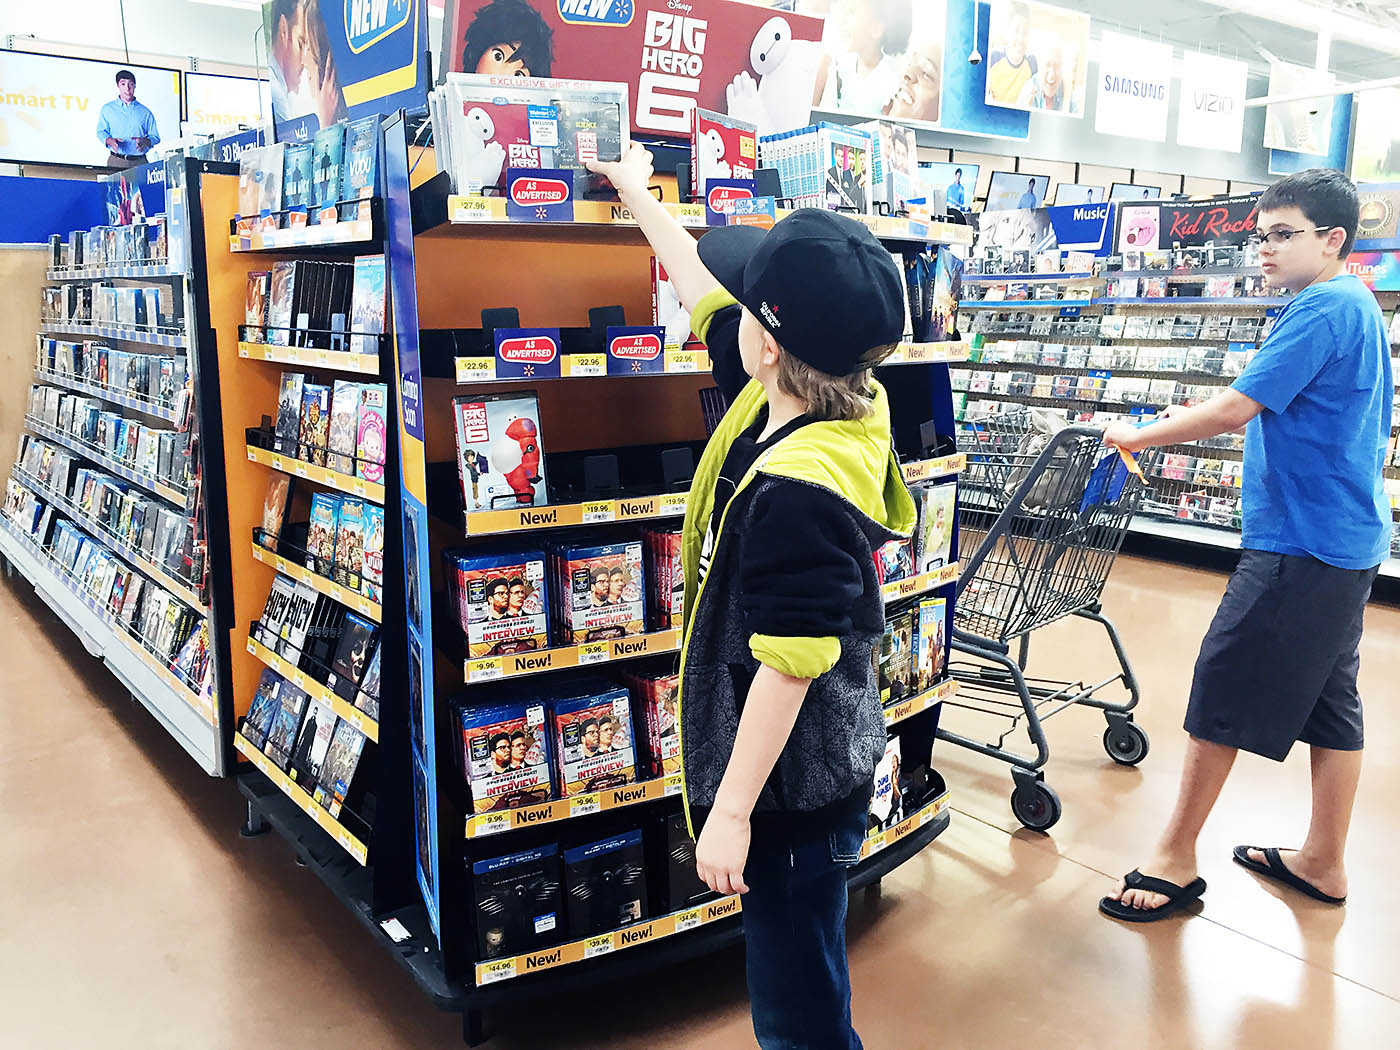 Big Hero 6 at Walmart